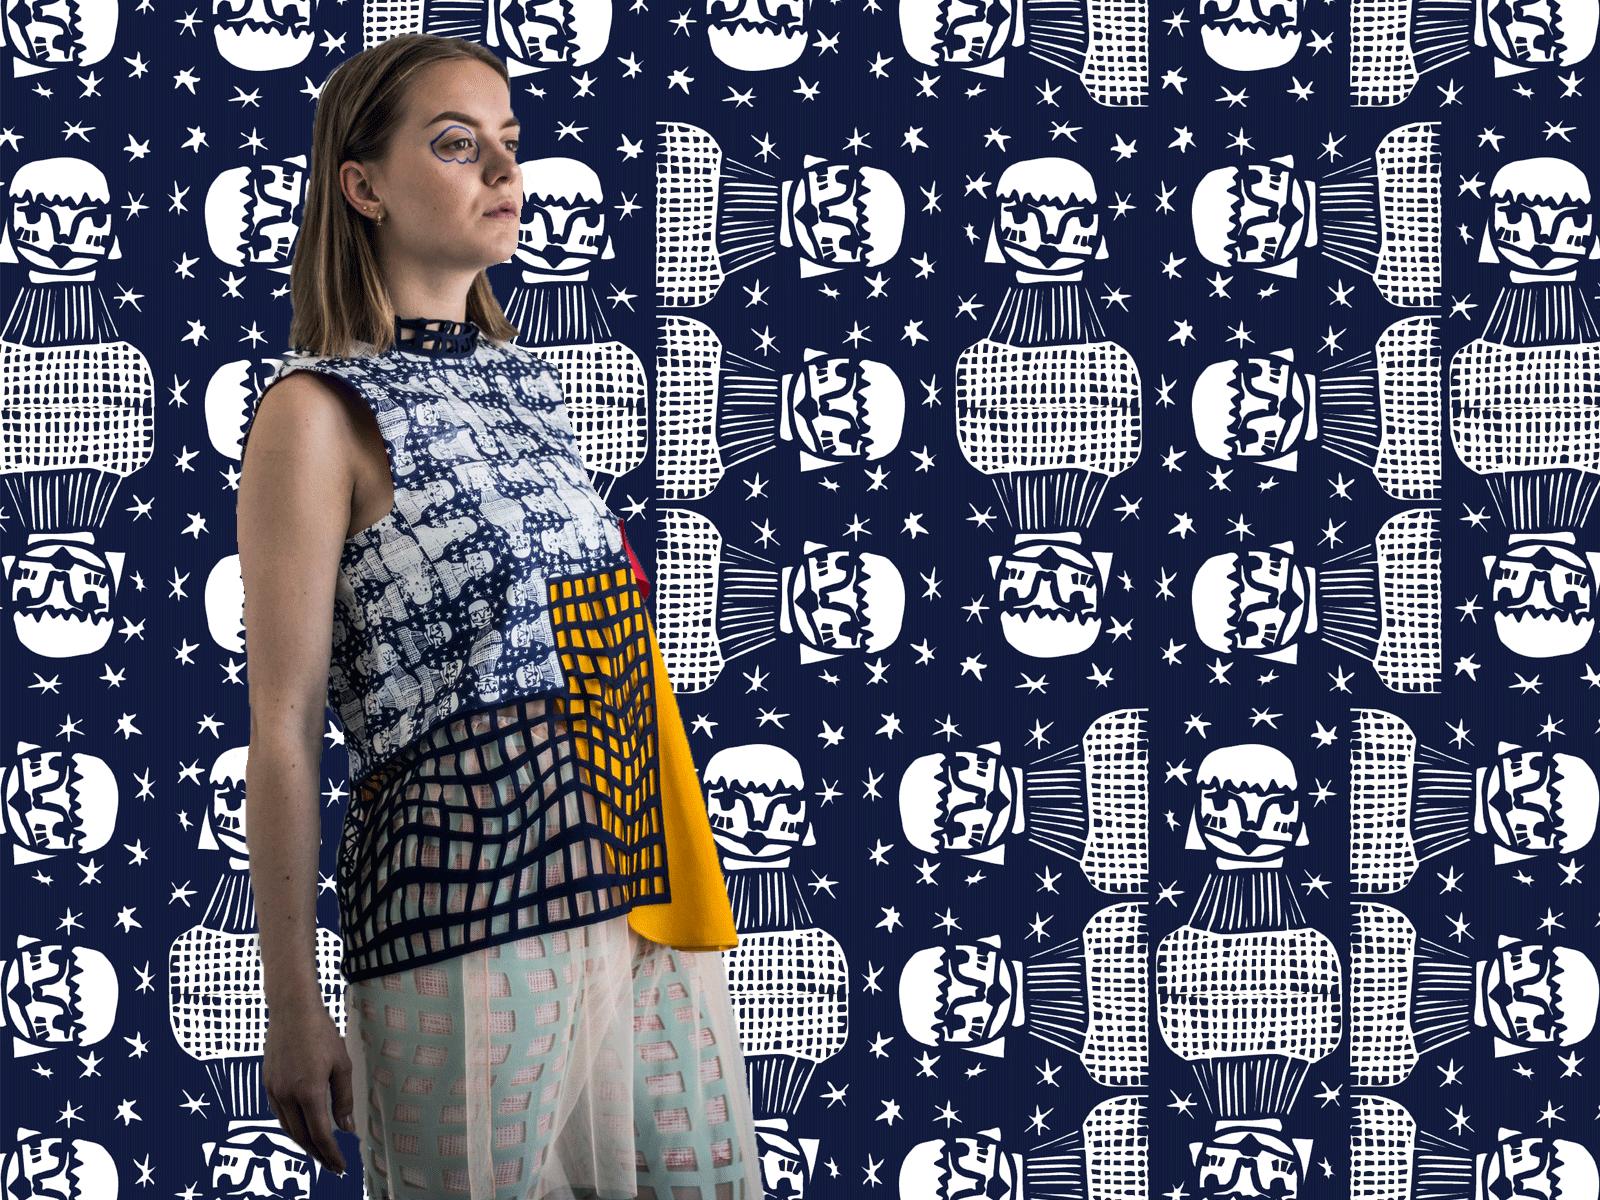 SS18-blue-girl-textile